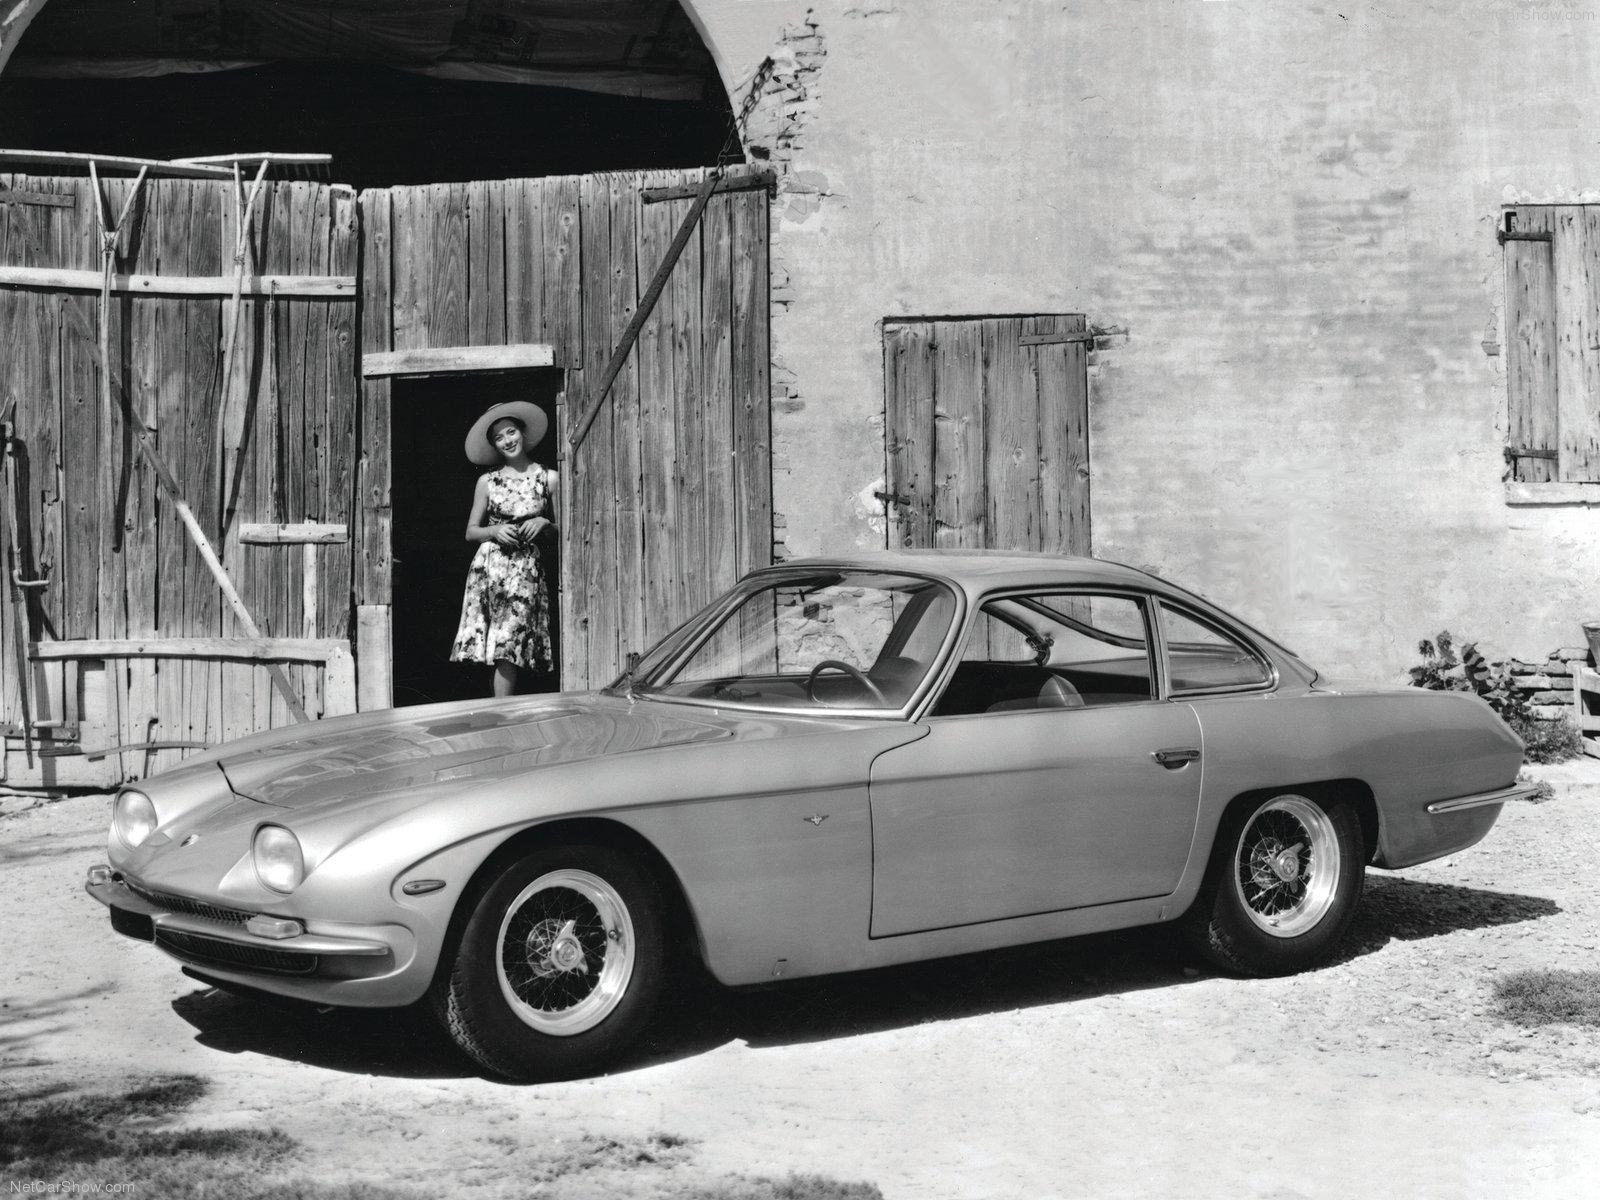 Hình ảnh siêu xe Lamborghini 350 GT 1964 & nội ngoại thất